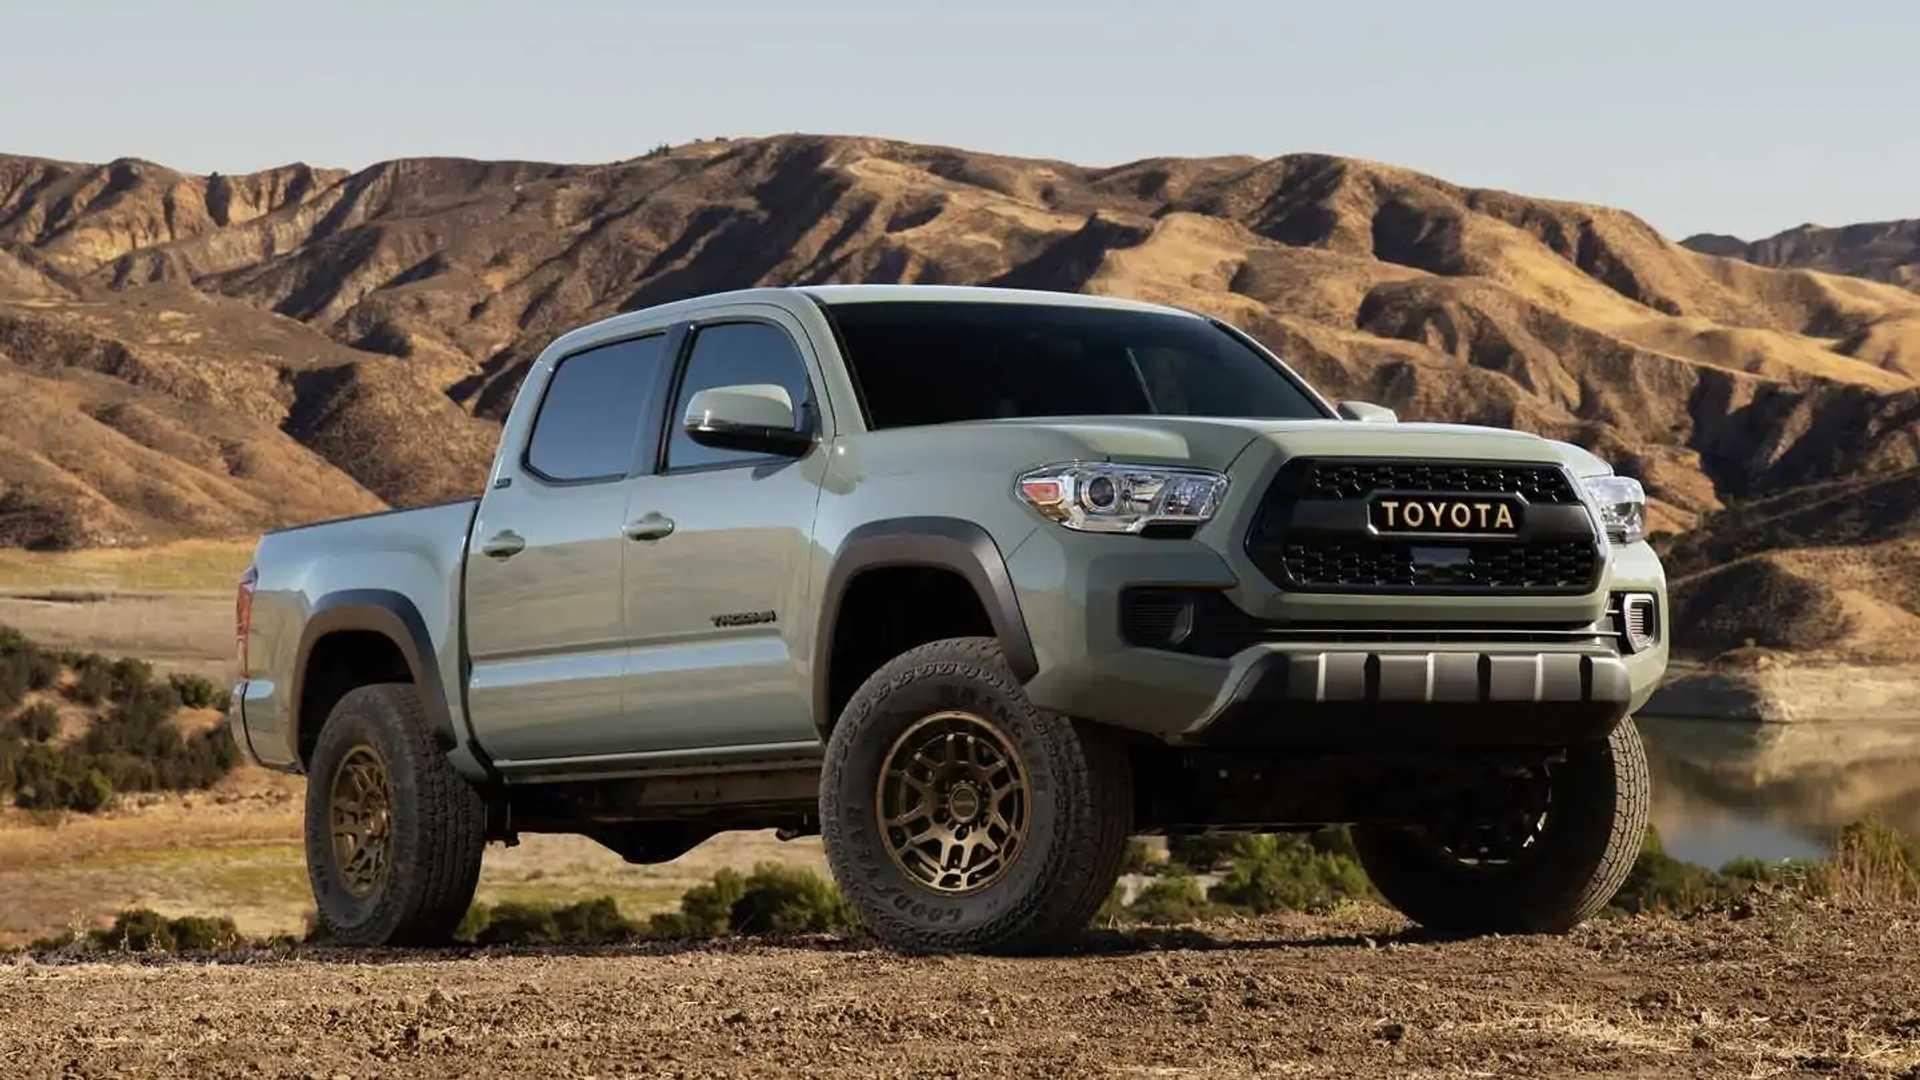 Toyota Tacoma обзавелась новыми версиями Trail Edition и TRD Pro